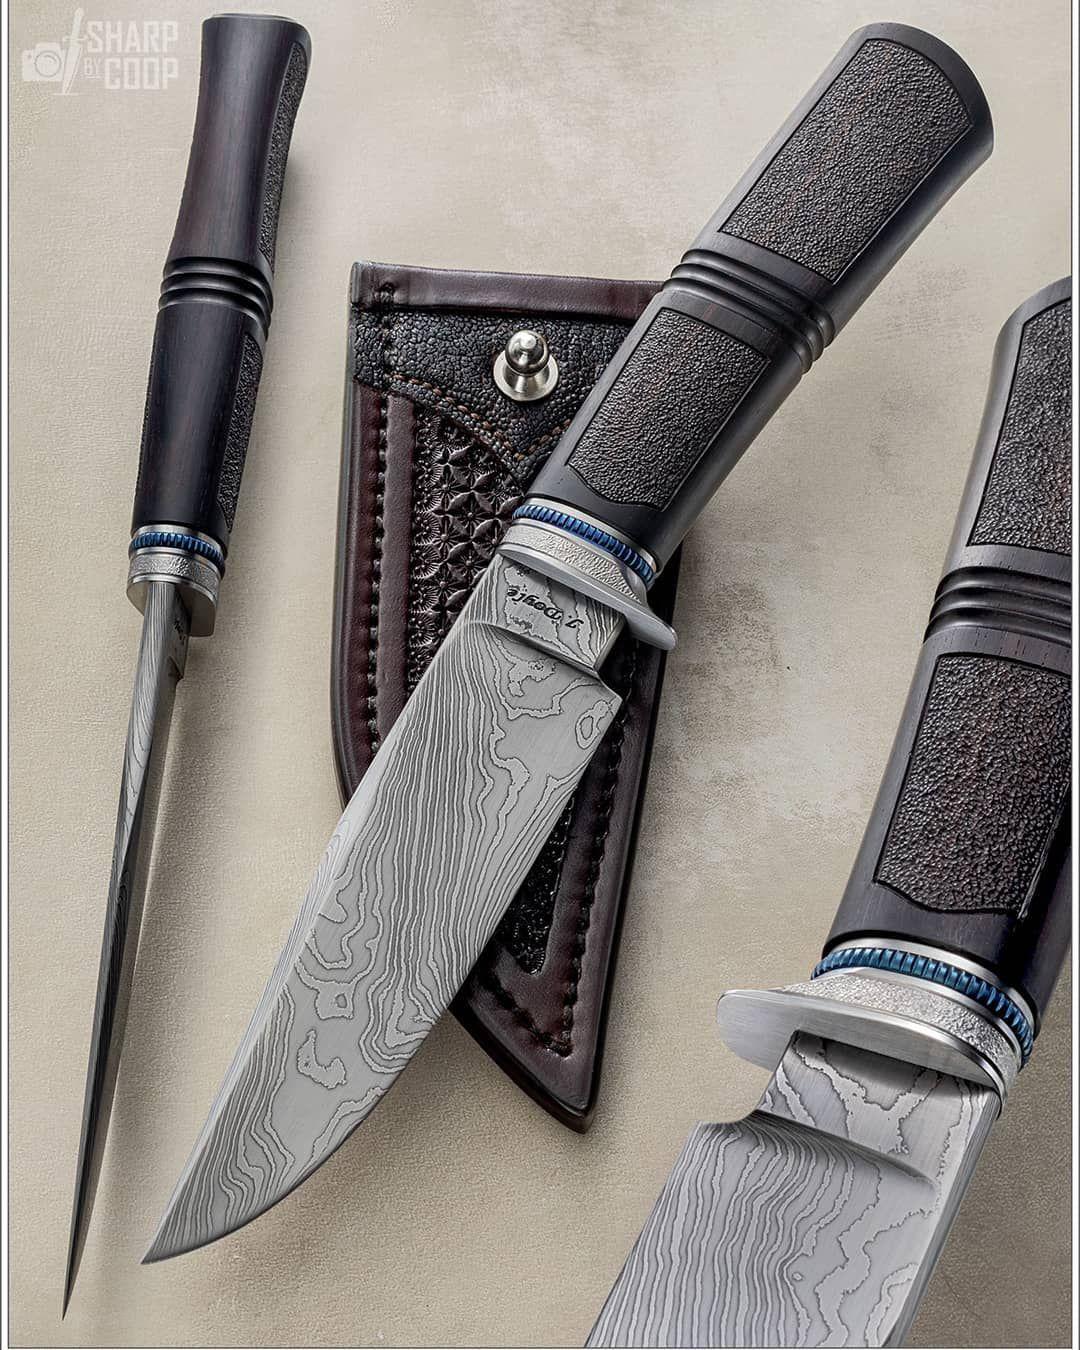 Hand Forged Knife 1084 Walnut Hand Forged Knife Knife Making Forge Knife